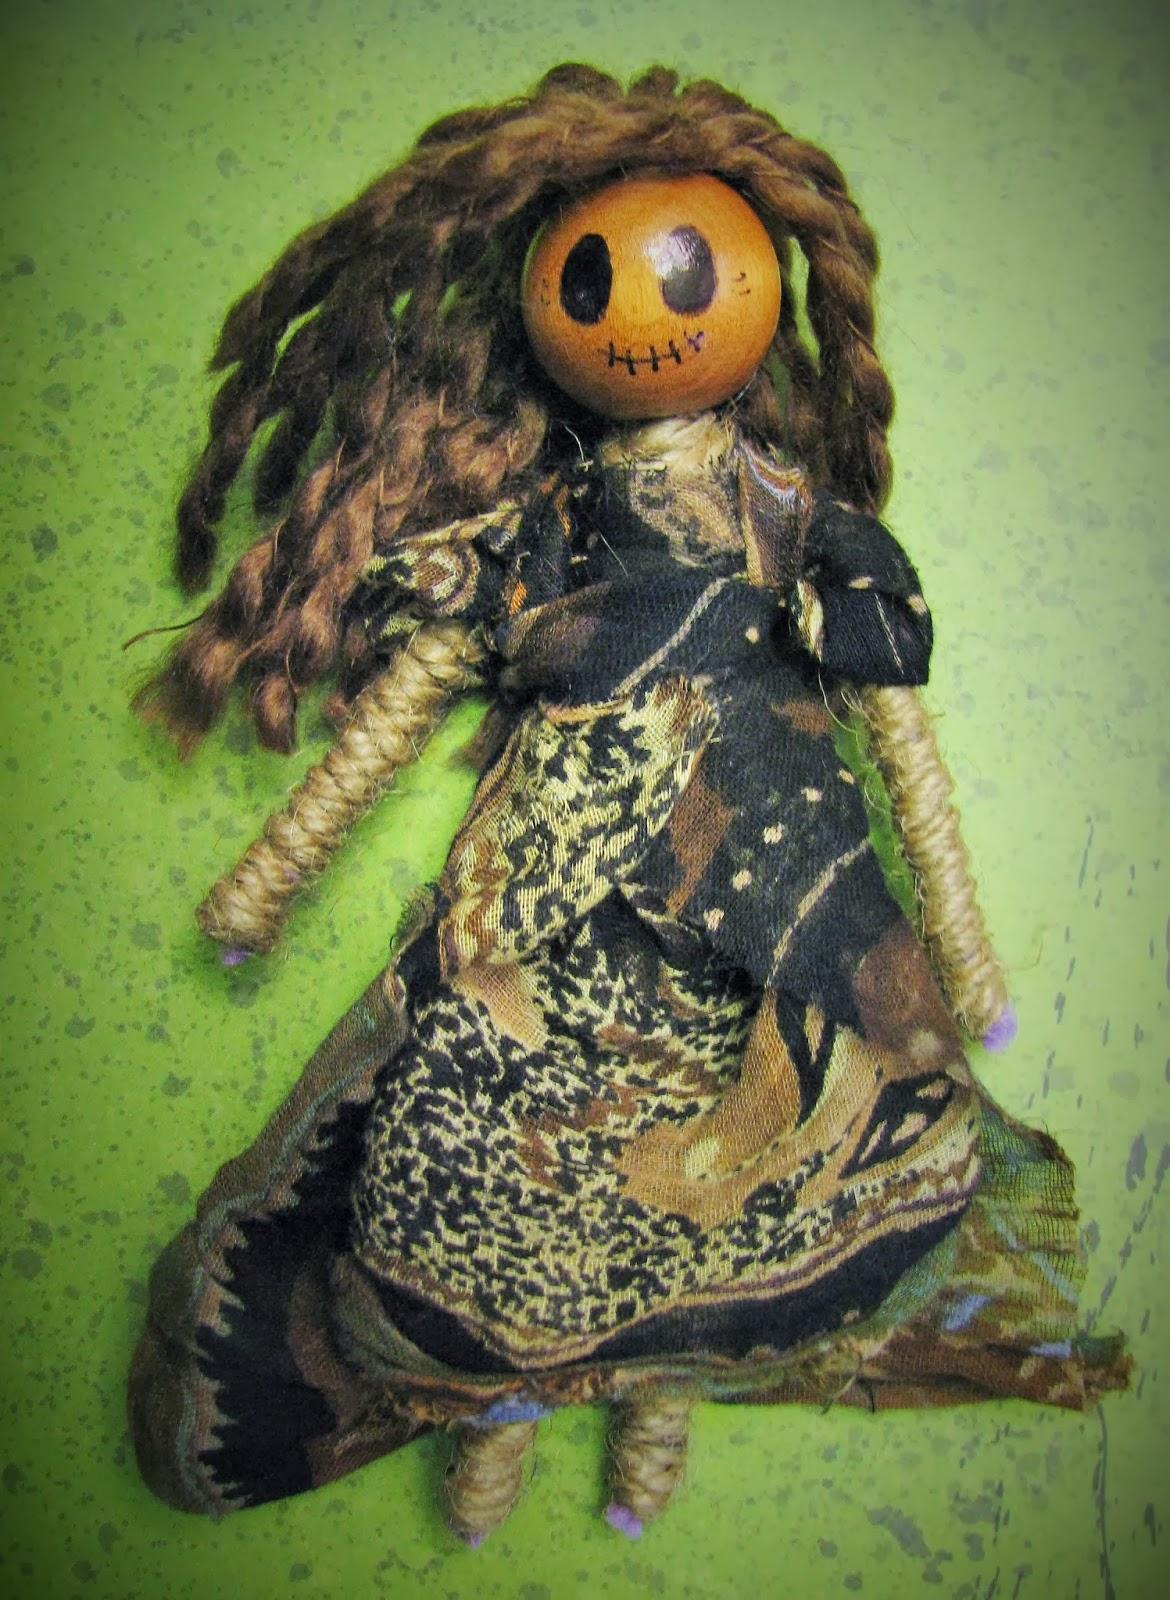 yarn voodoo doll instructions